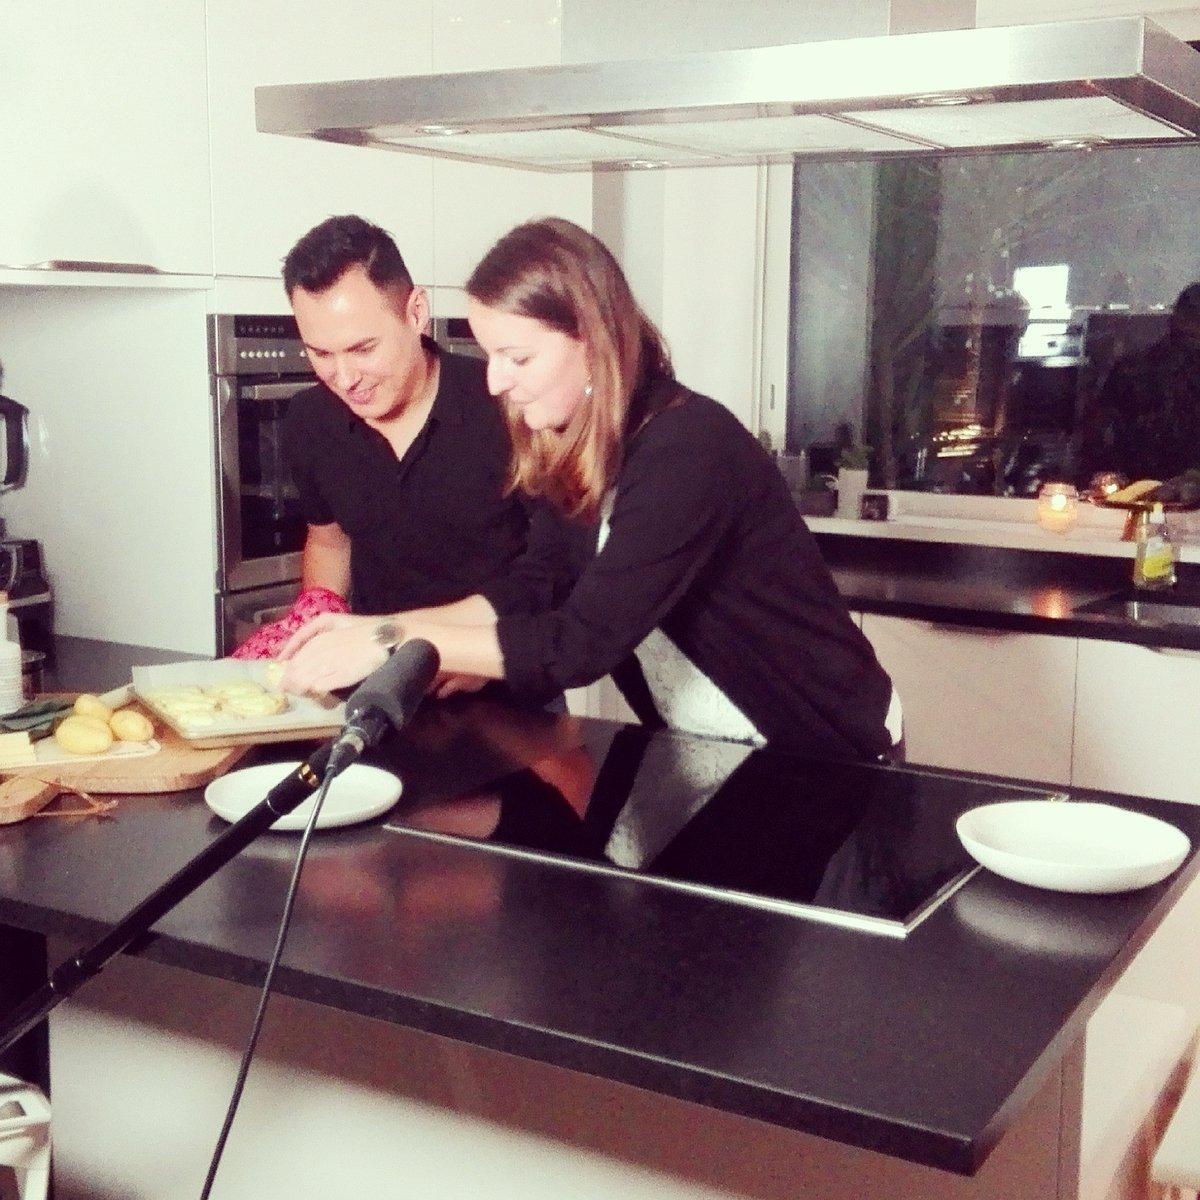 Herv cuisine hervecuisine twitter - Youtube herve cuisine ...